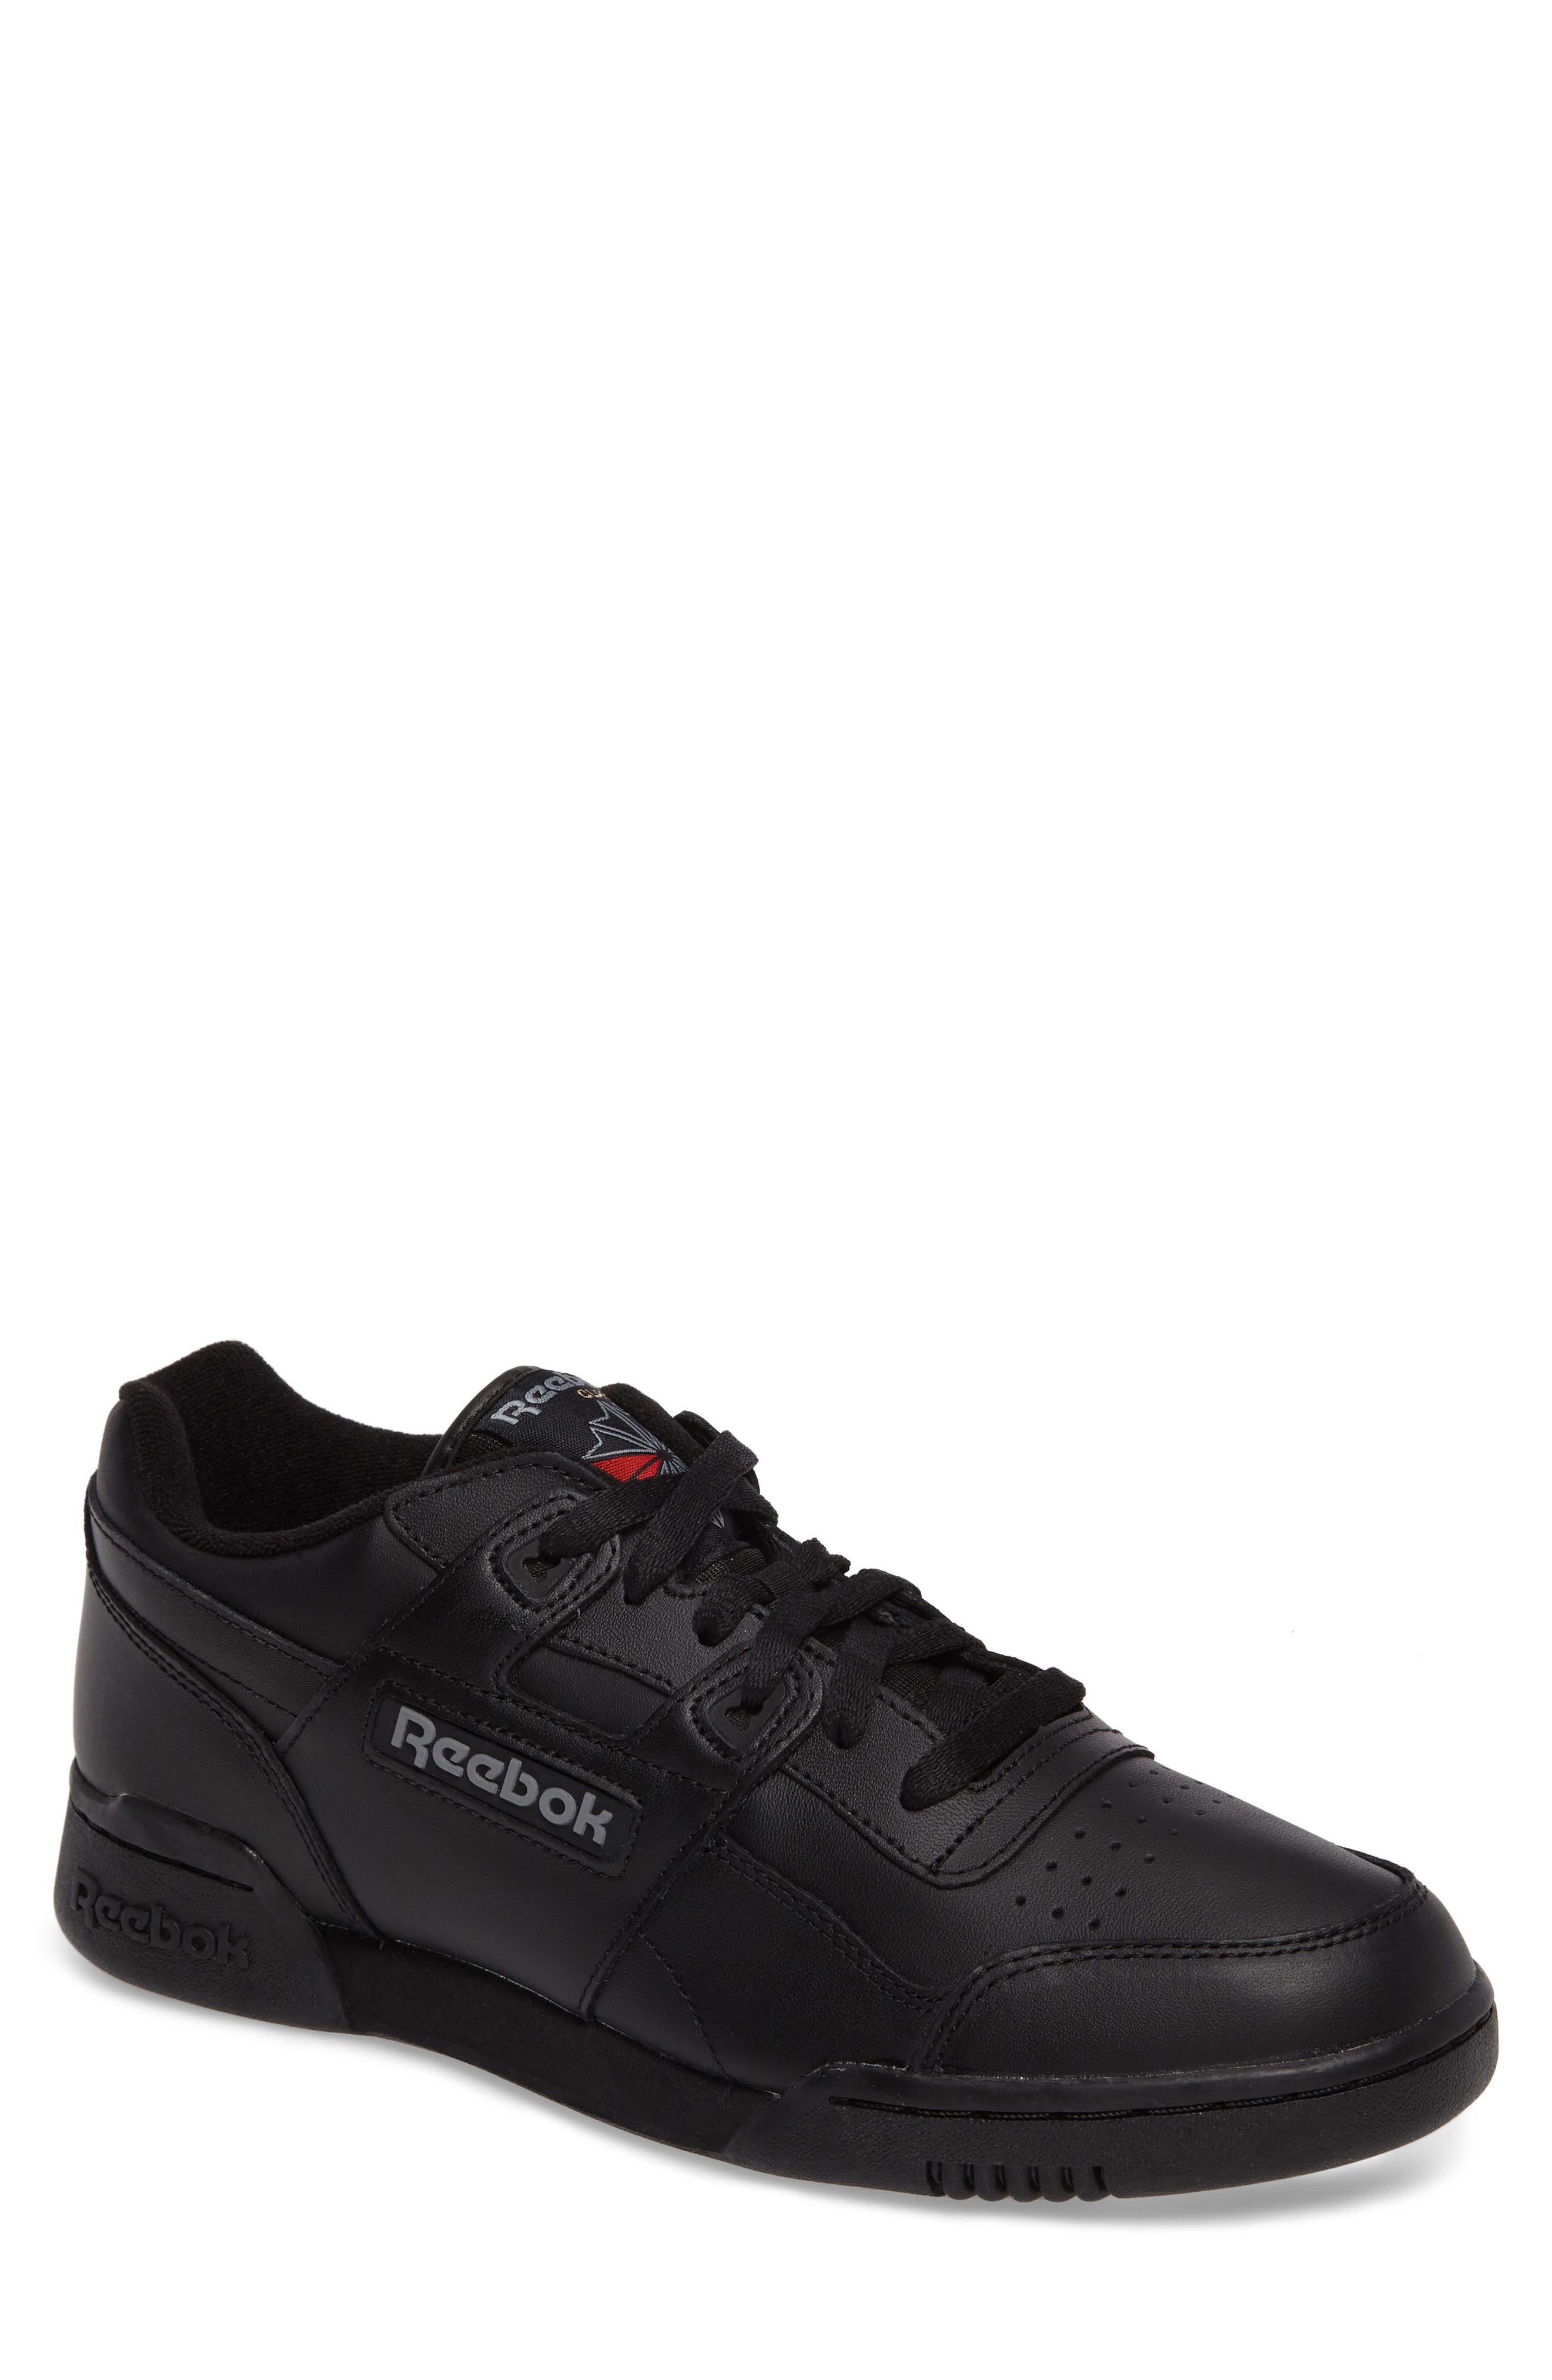 Workout Plus Sneaker,                             Main thumbnail 1, color,                             Black/ Charcoal